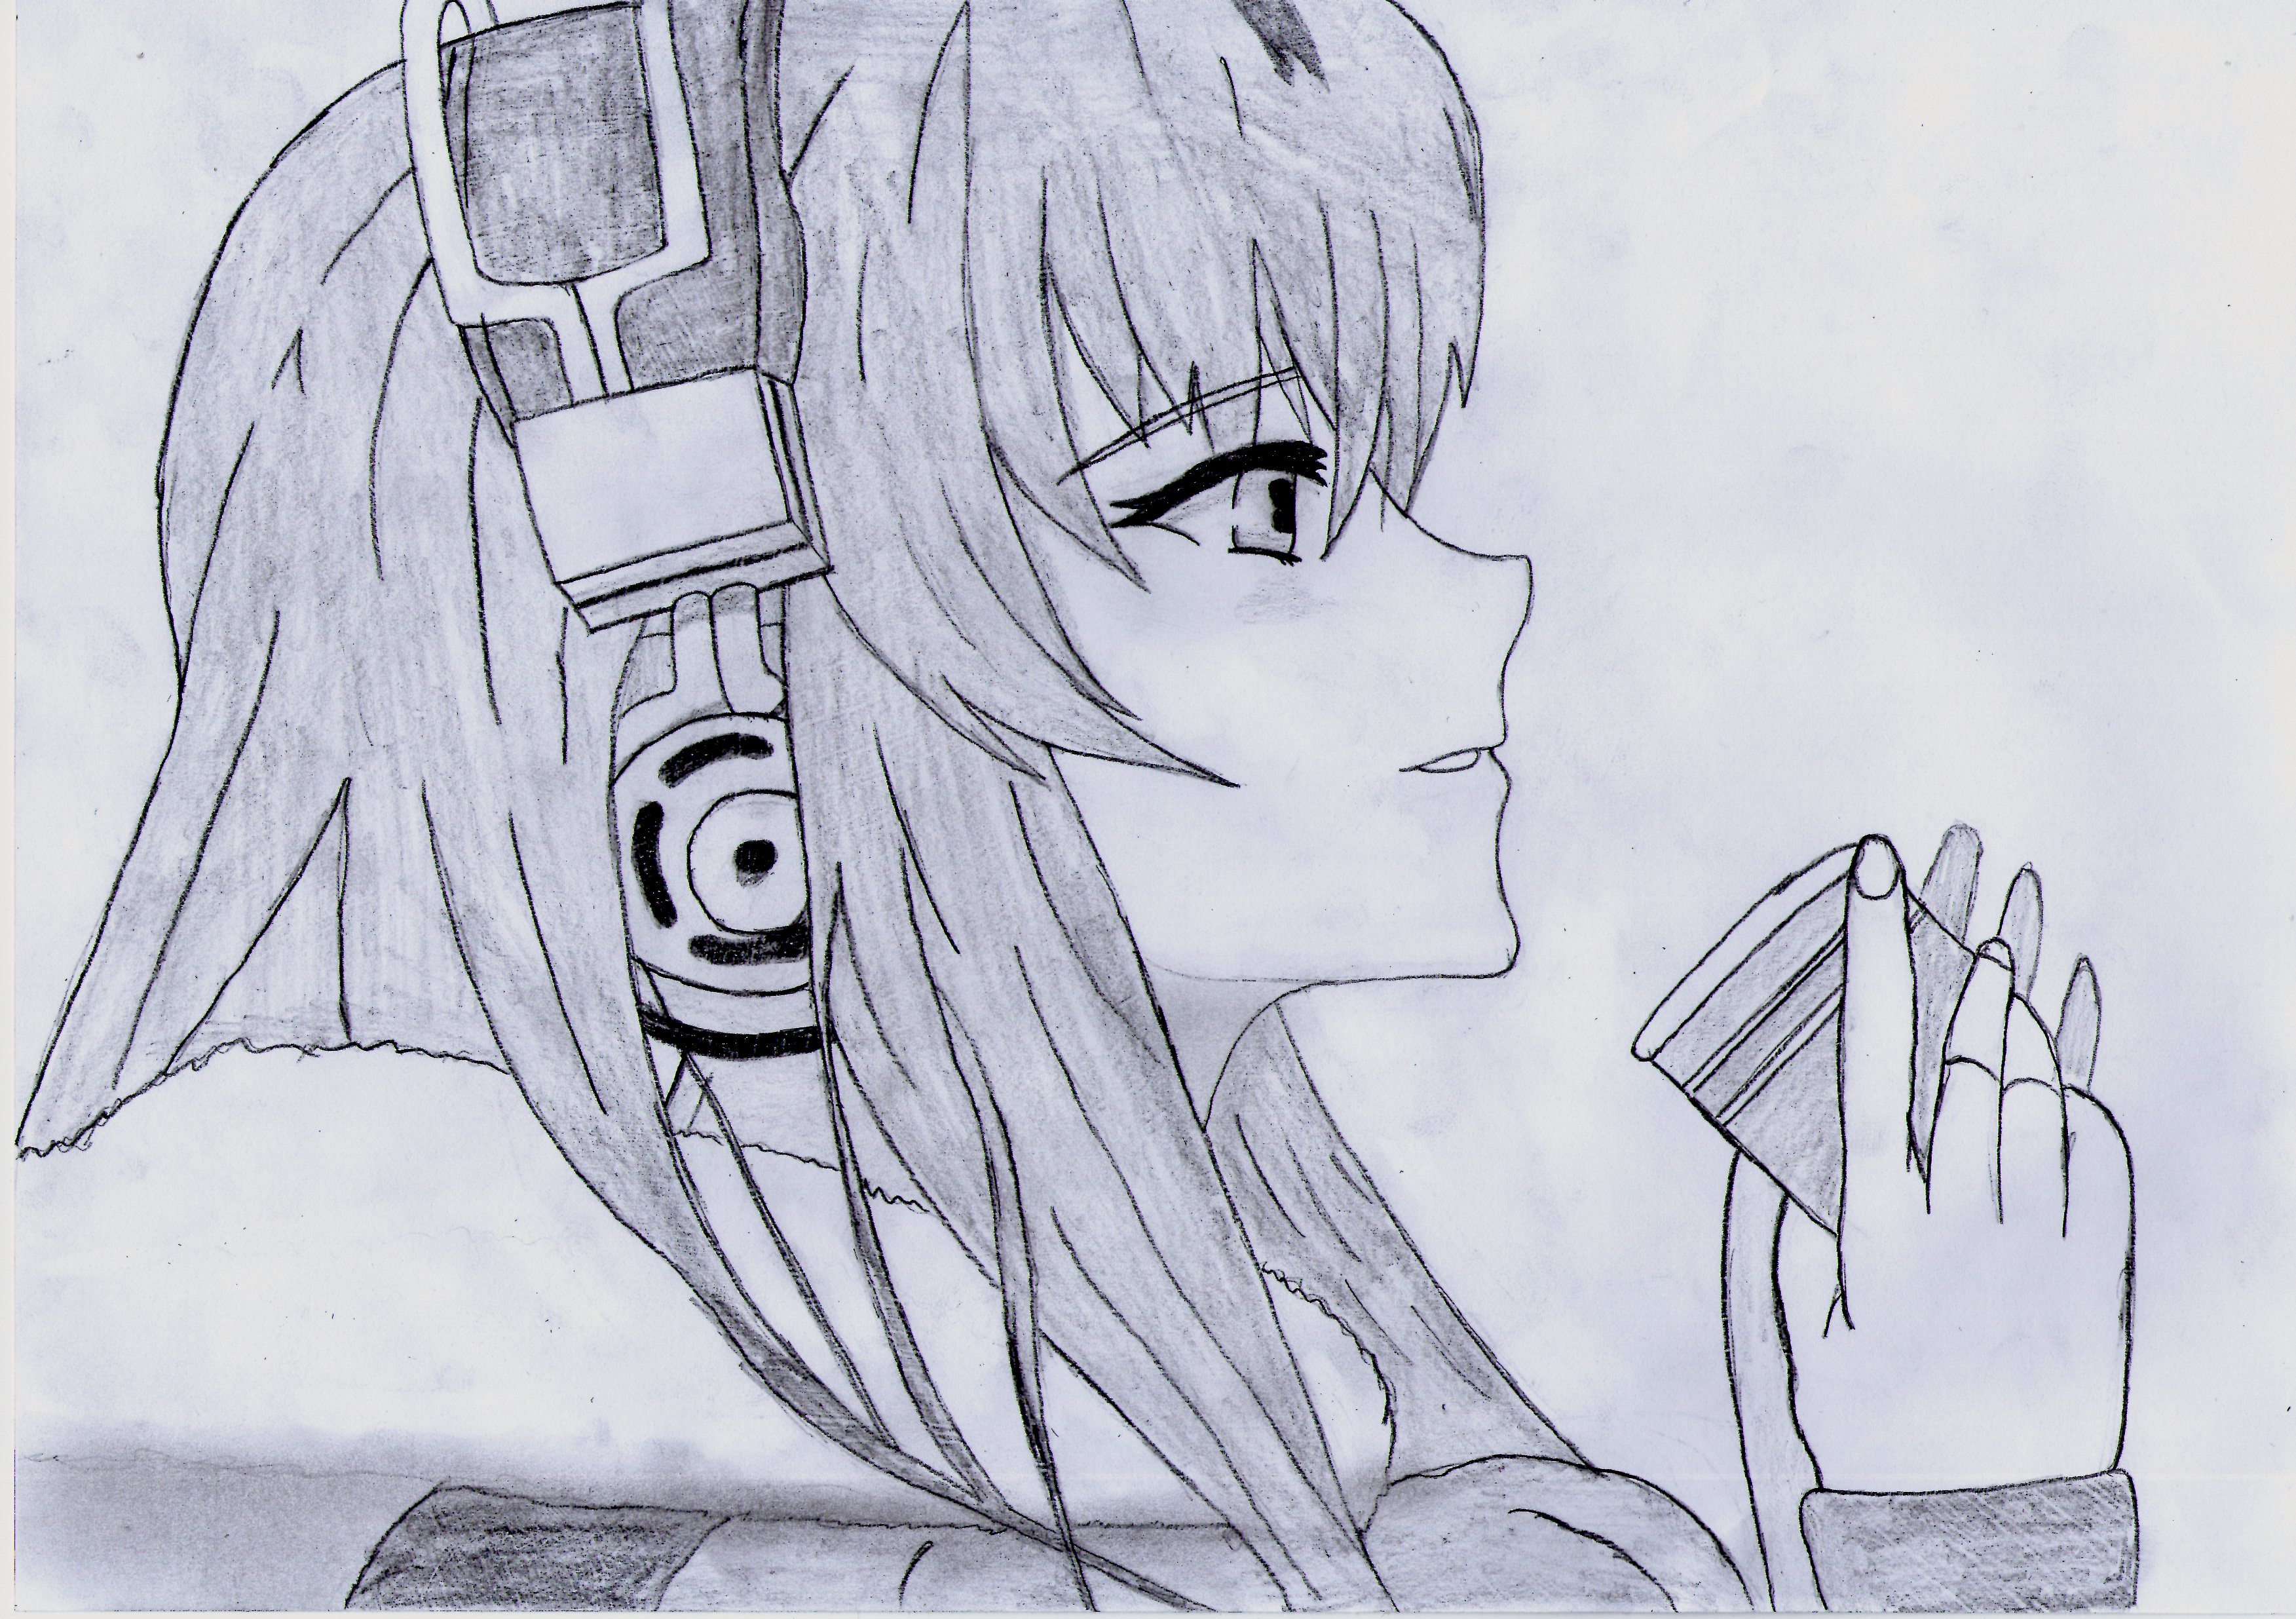 Headphone Anime Girl Drawing By 1DragonWarrior1 On DeviantArt